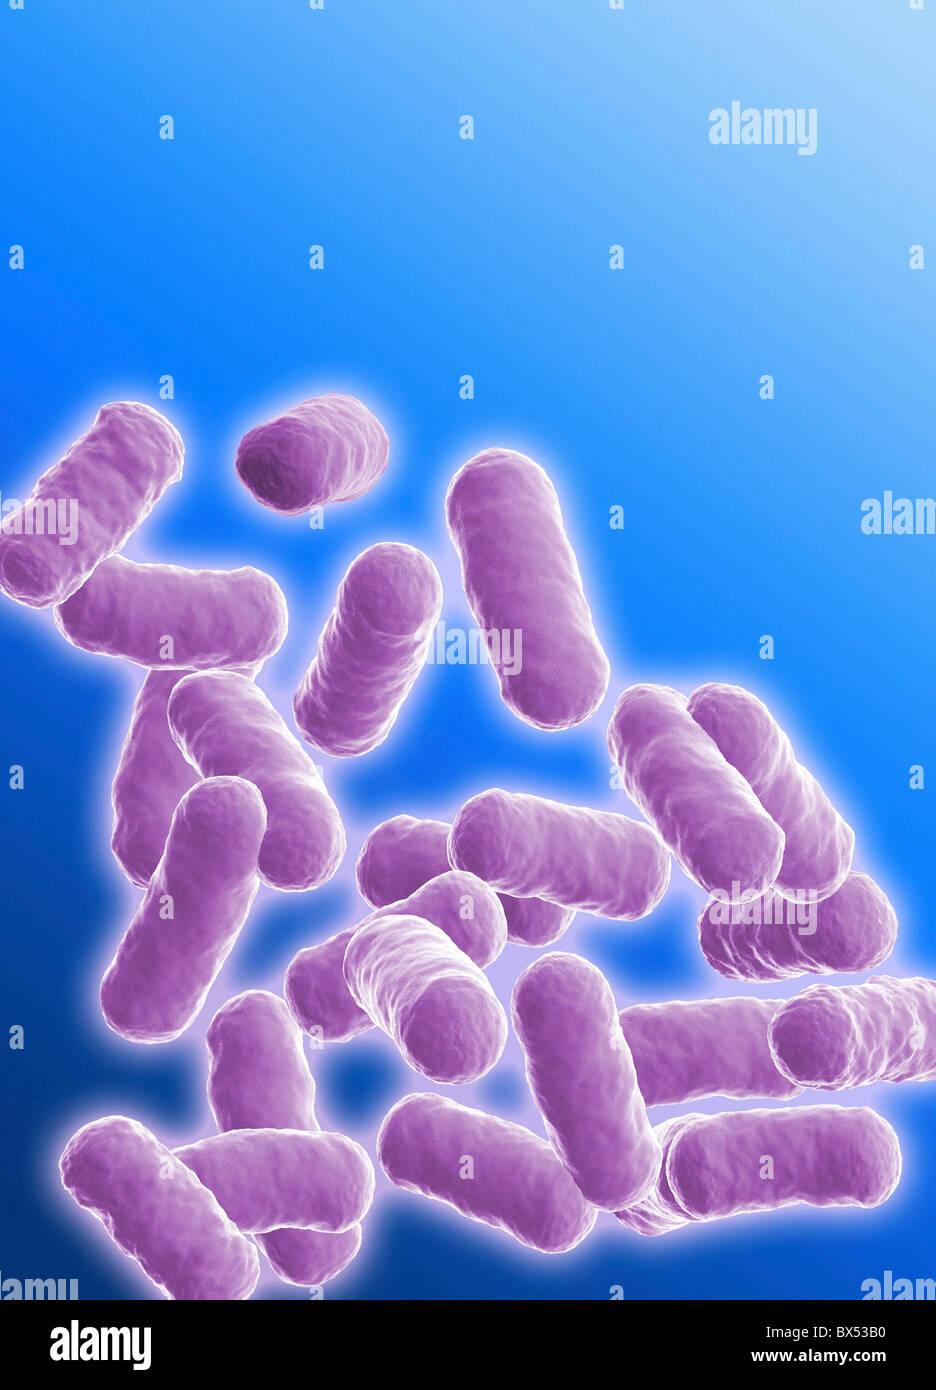 rod shape bacteria stock photos rod shape bacteria stock images